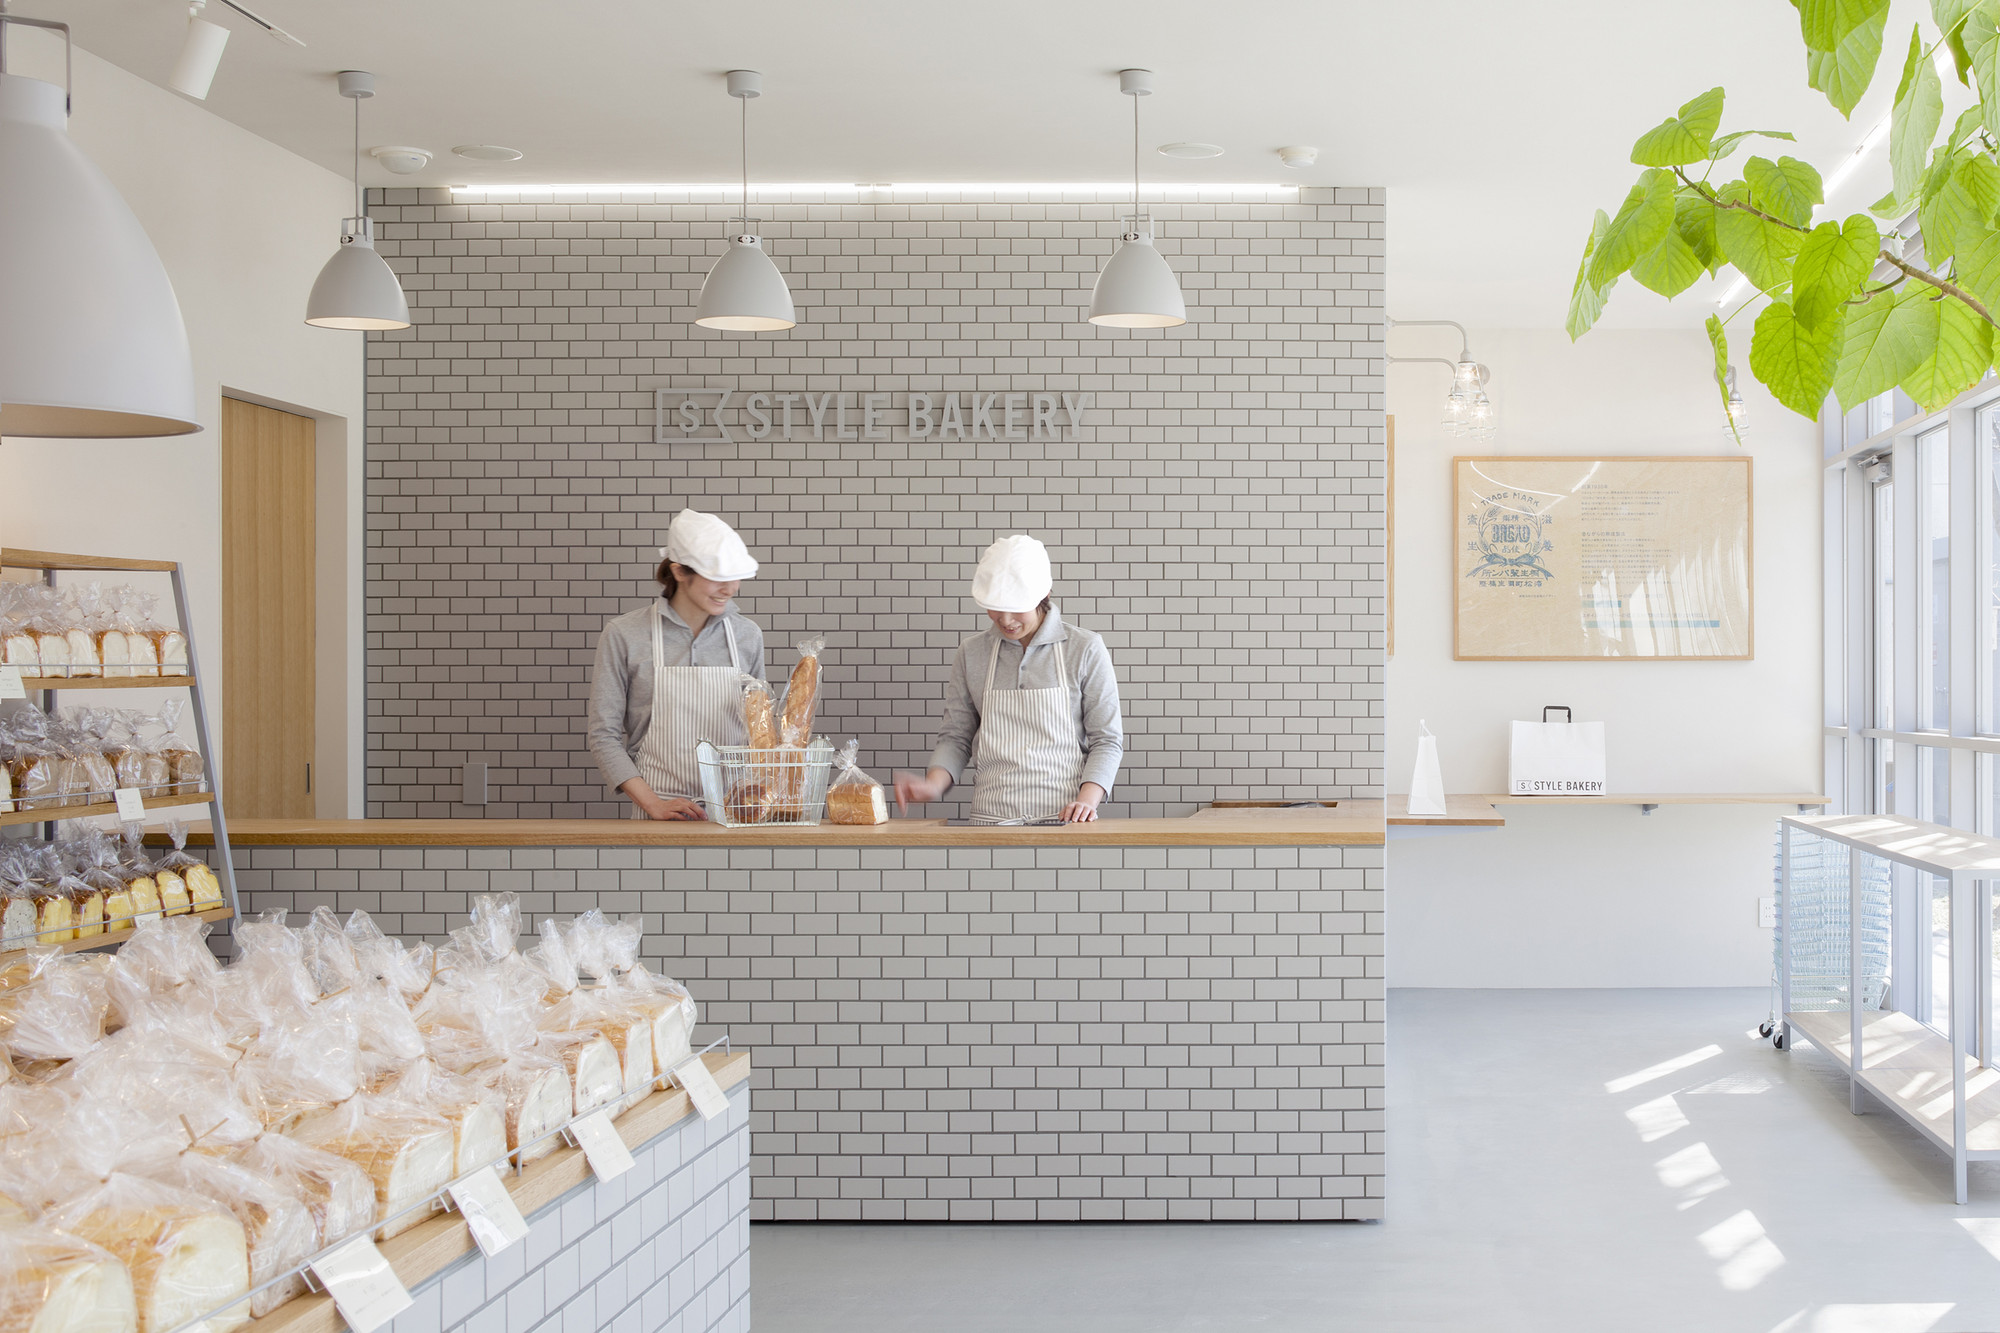 Style Bakery / SNARK, © Ippei Shinzawa